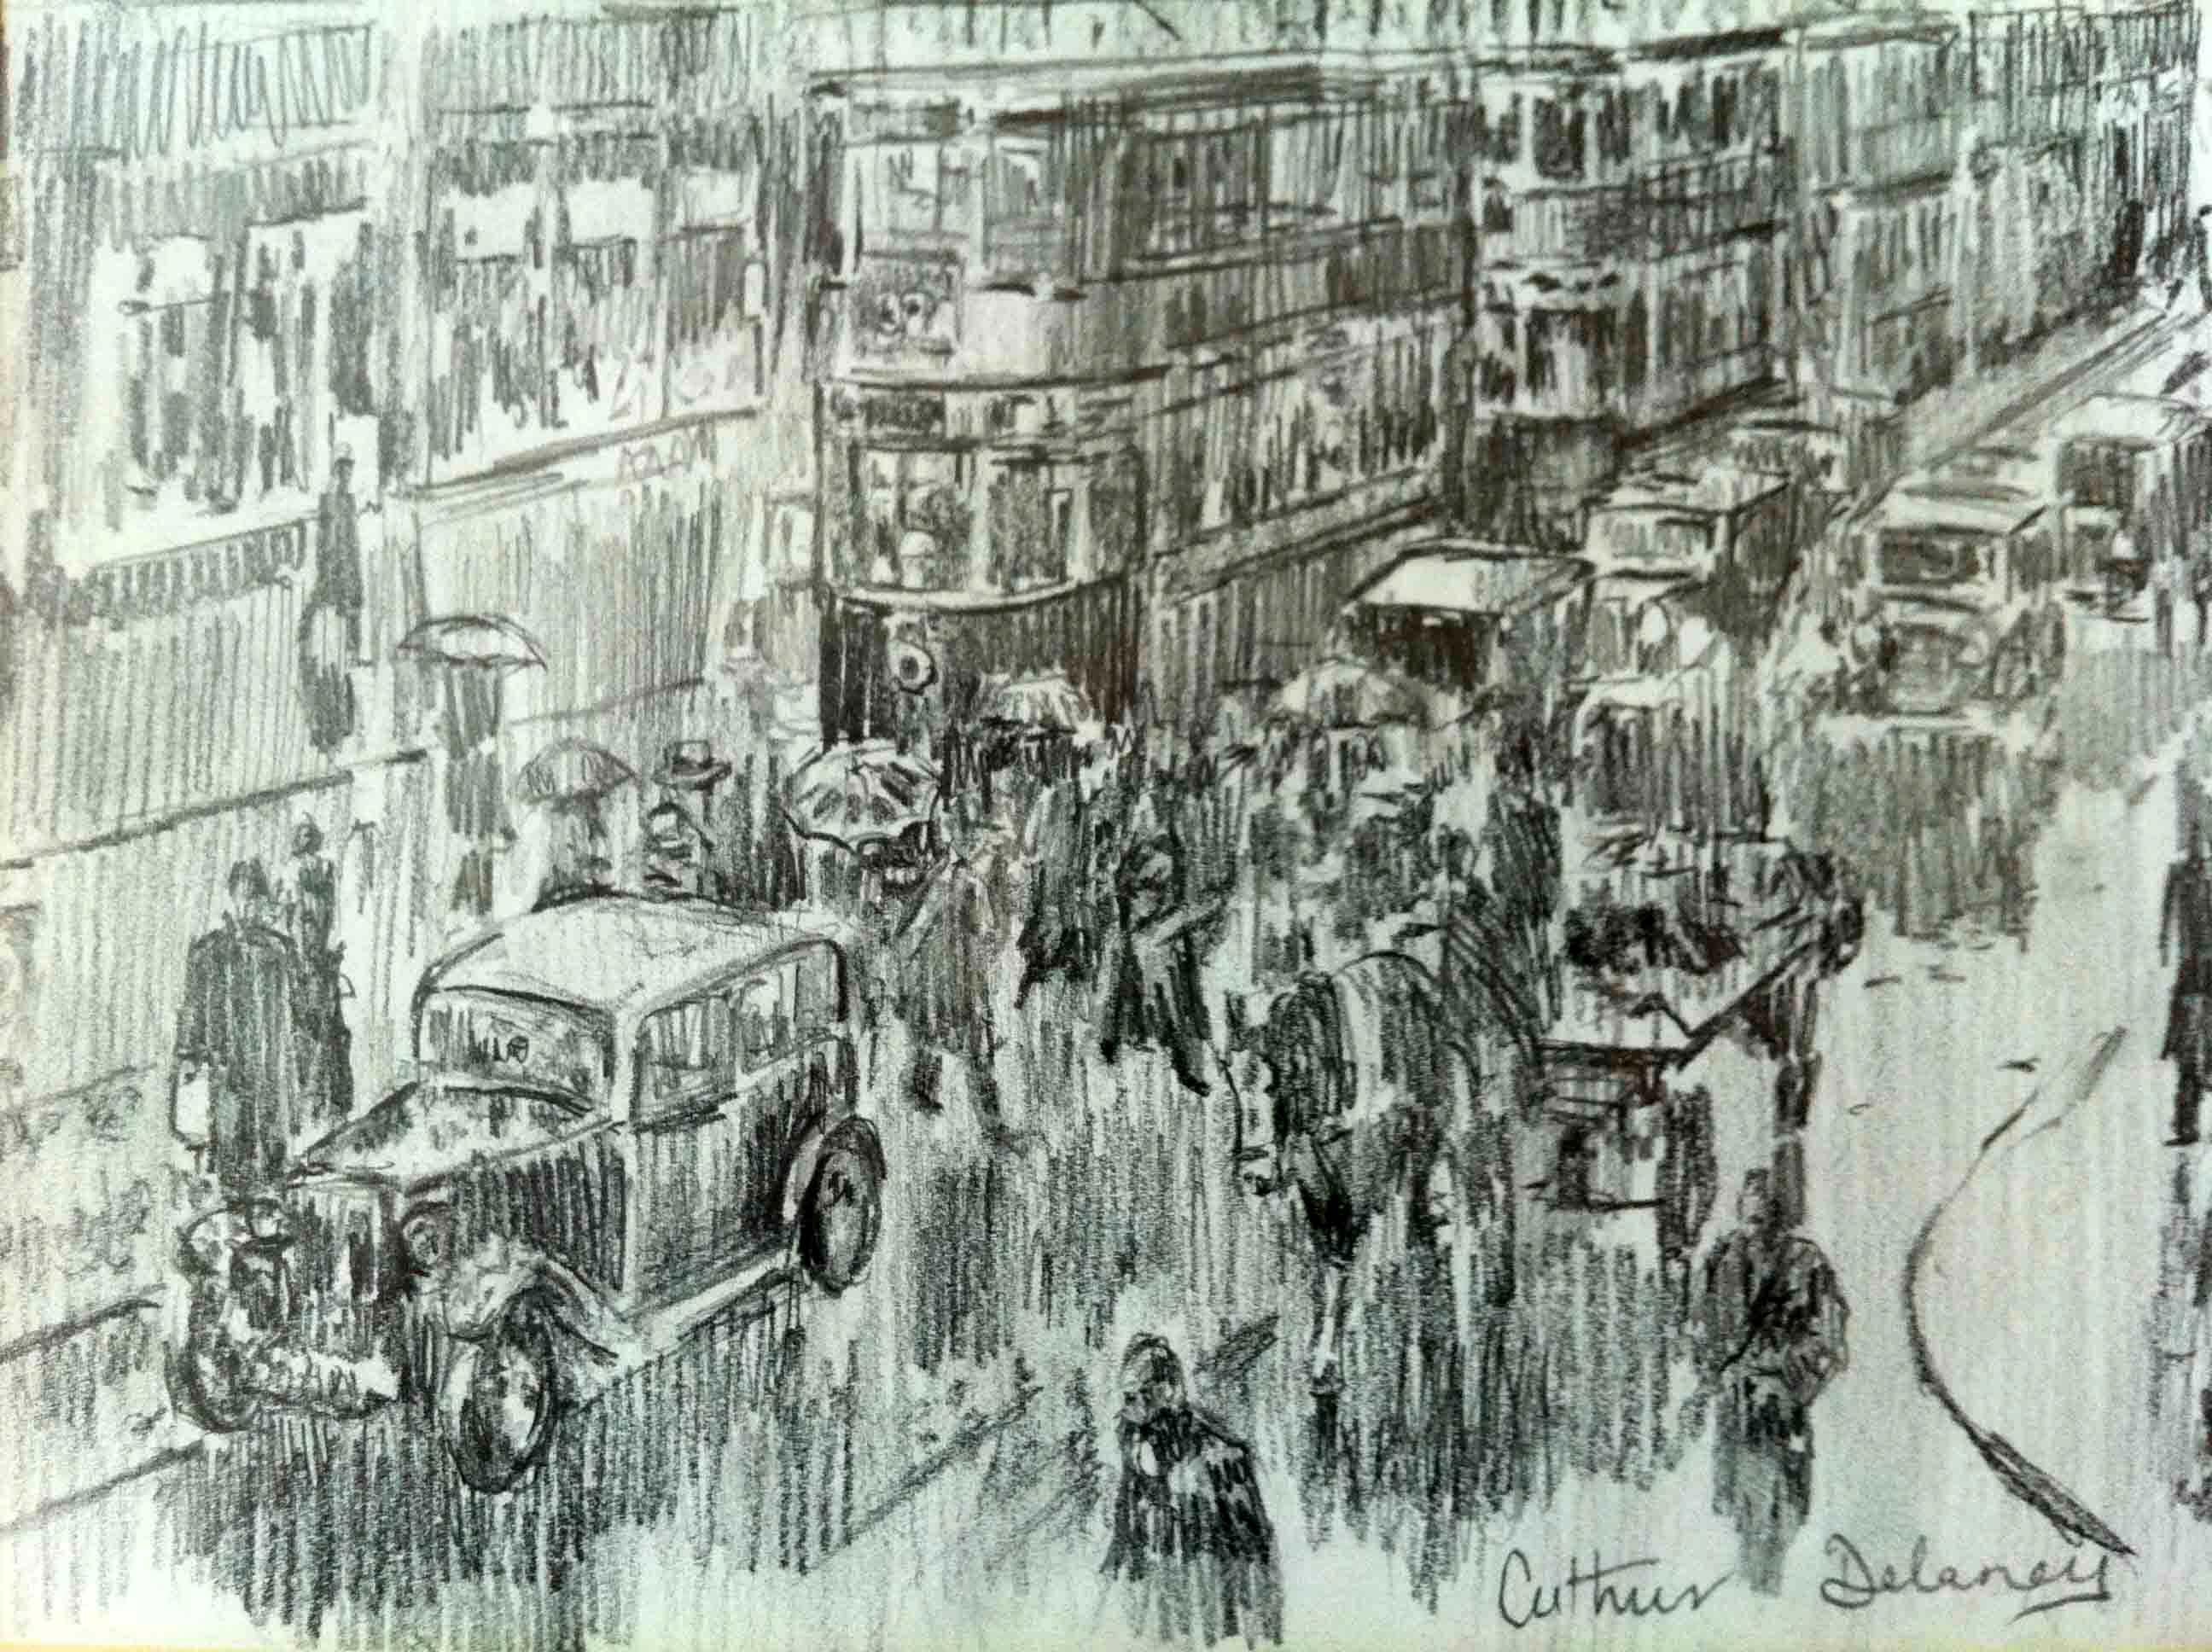 Arthur Delaney 'Market St Manchester' Carnes Fine Art